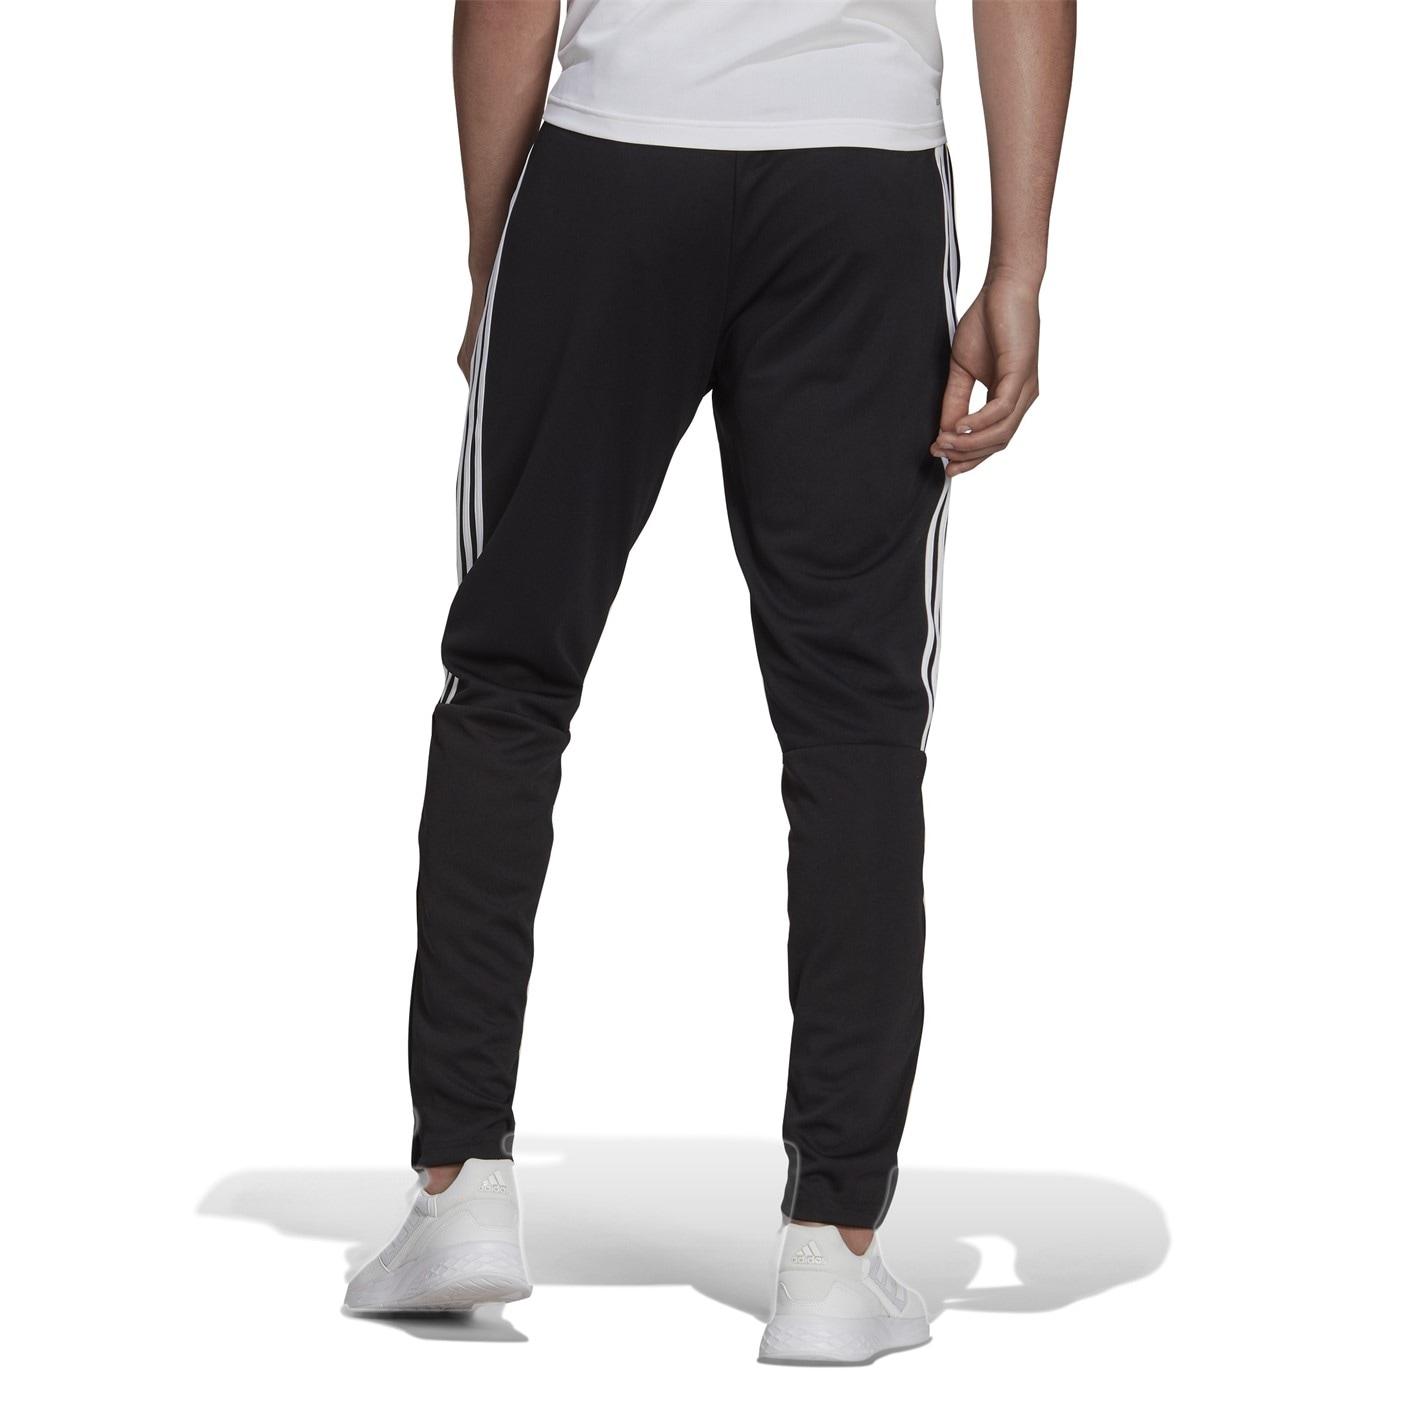 Pantaloni adidas fotbal Sereno 19 Slim negru alb